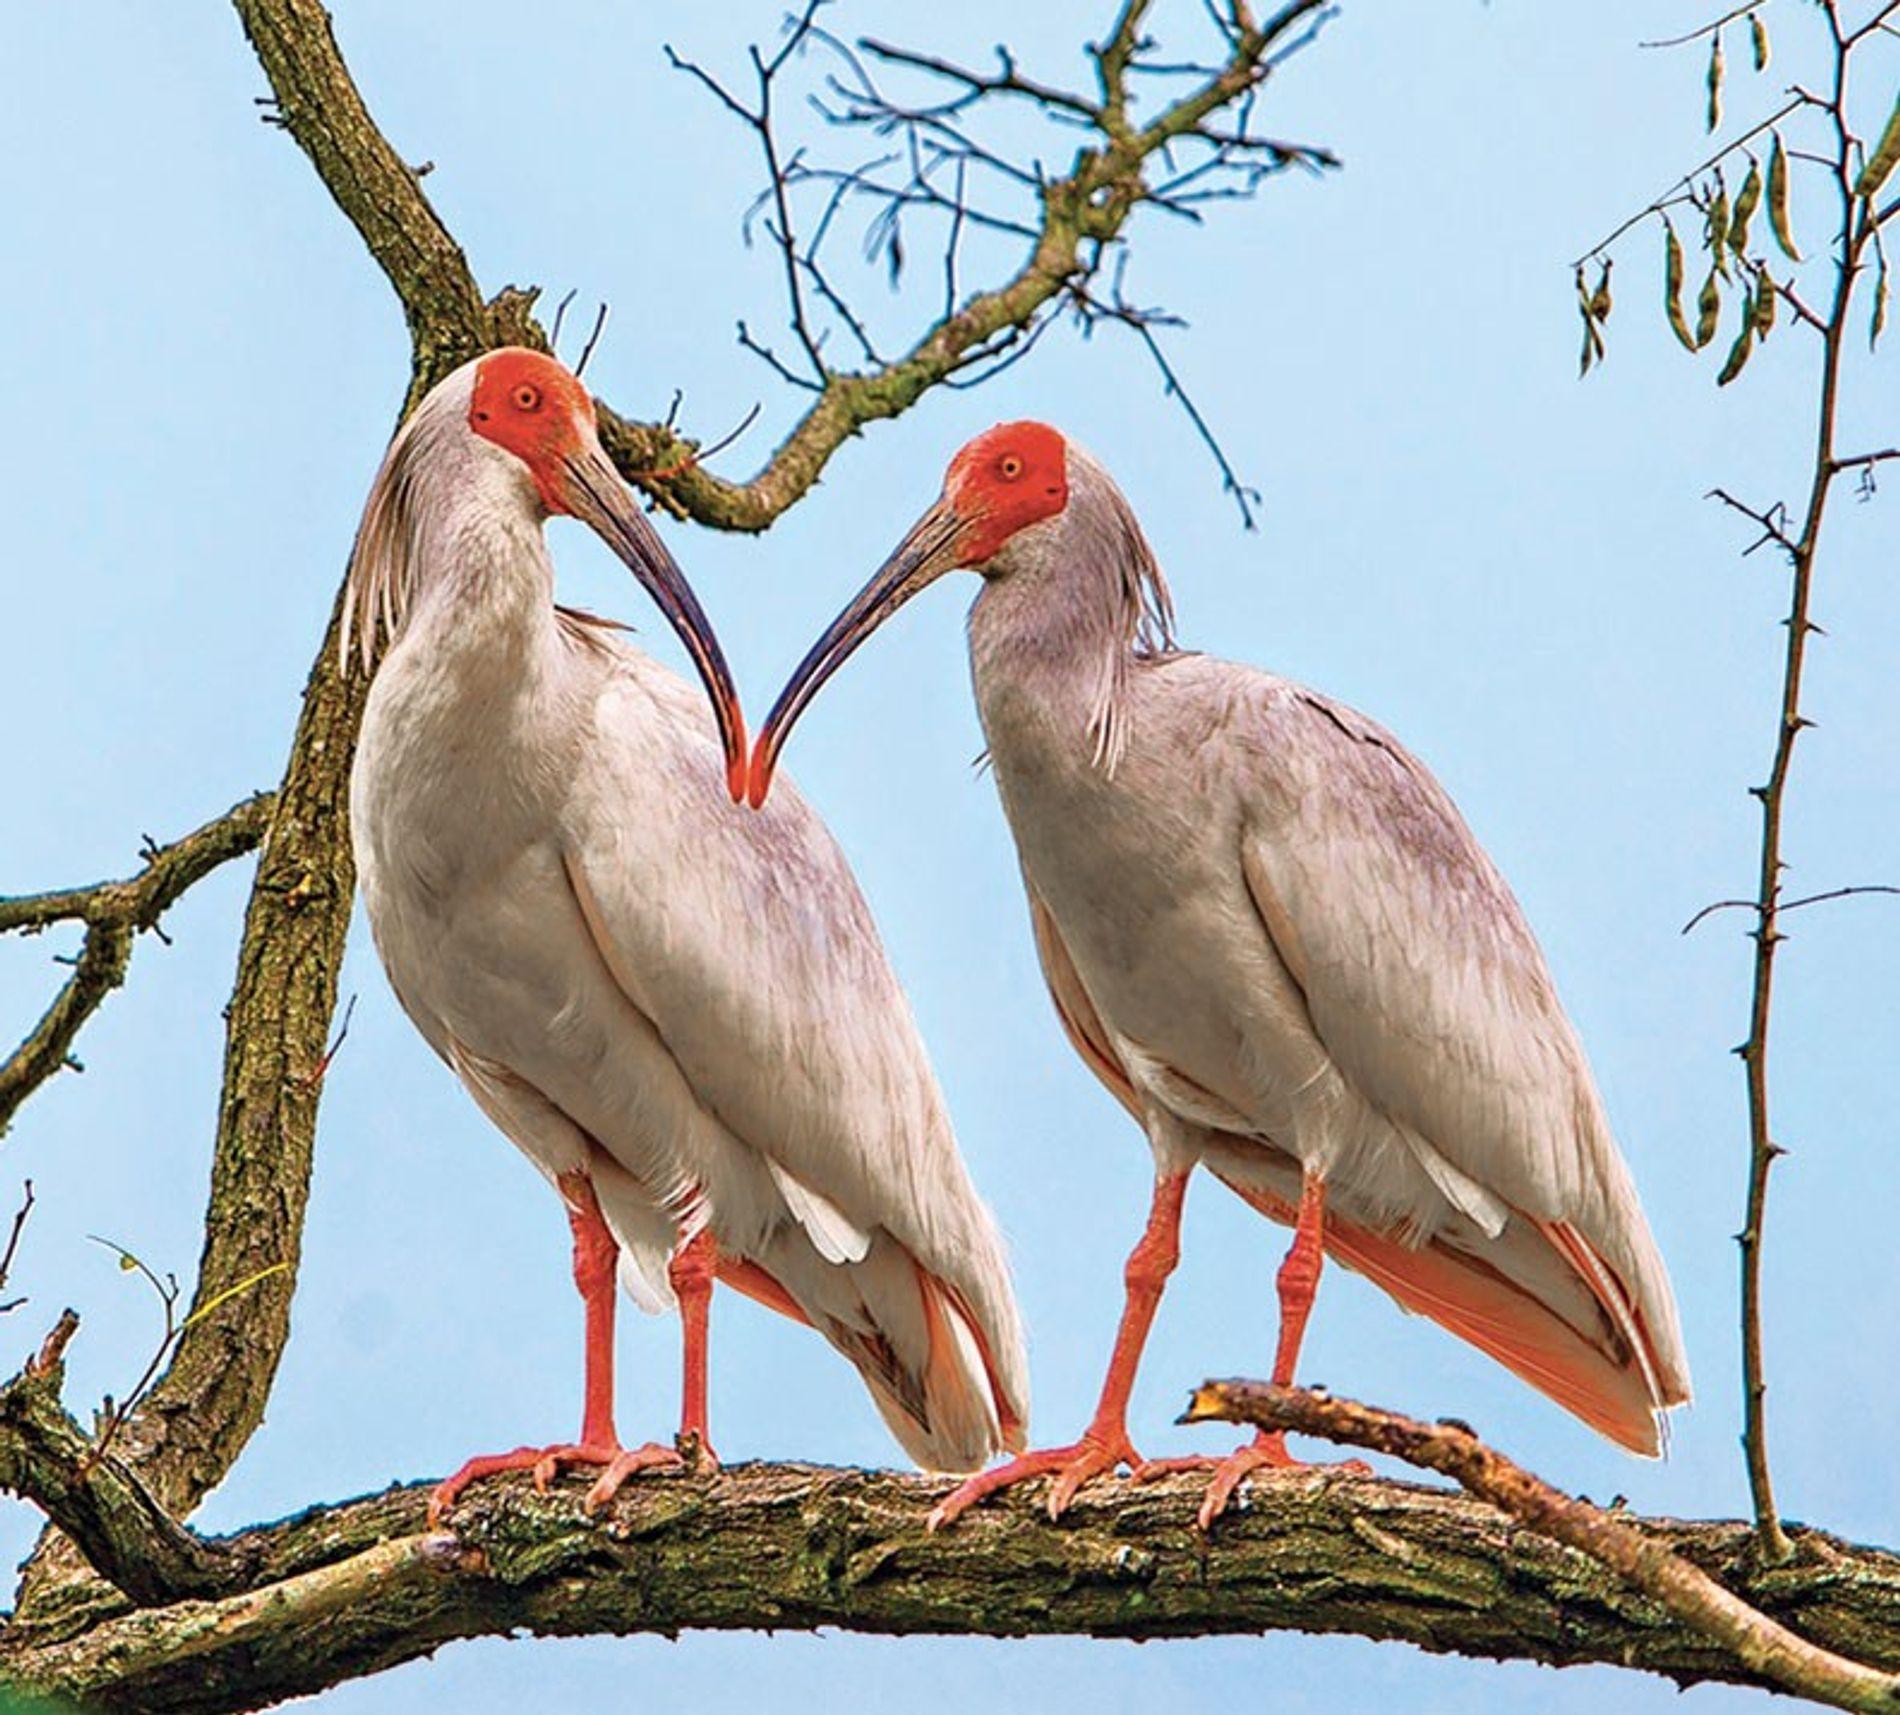 Birds are building simpler nests, plus laughing parrots!